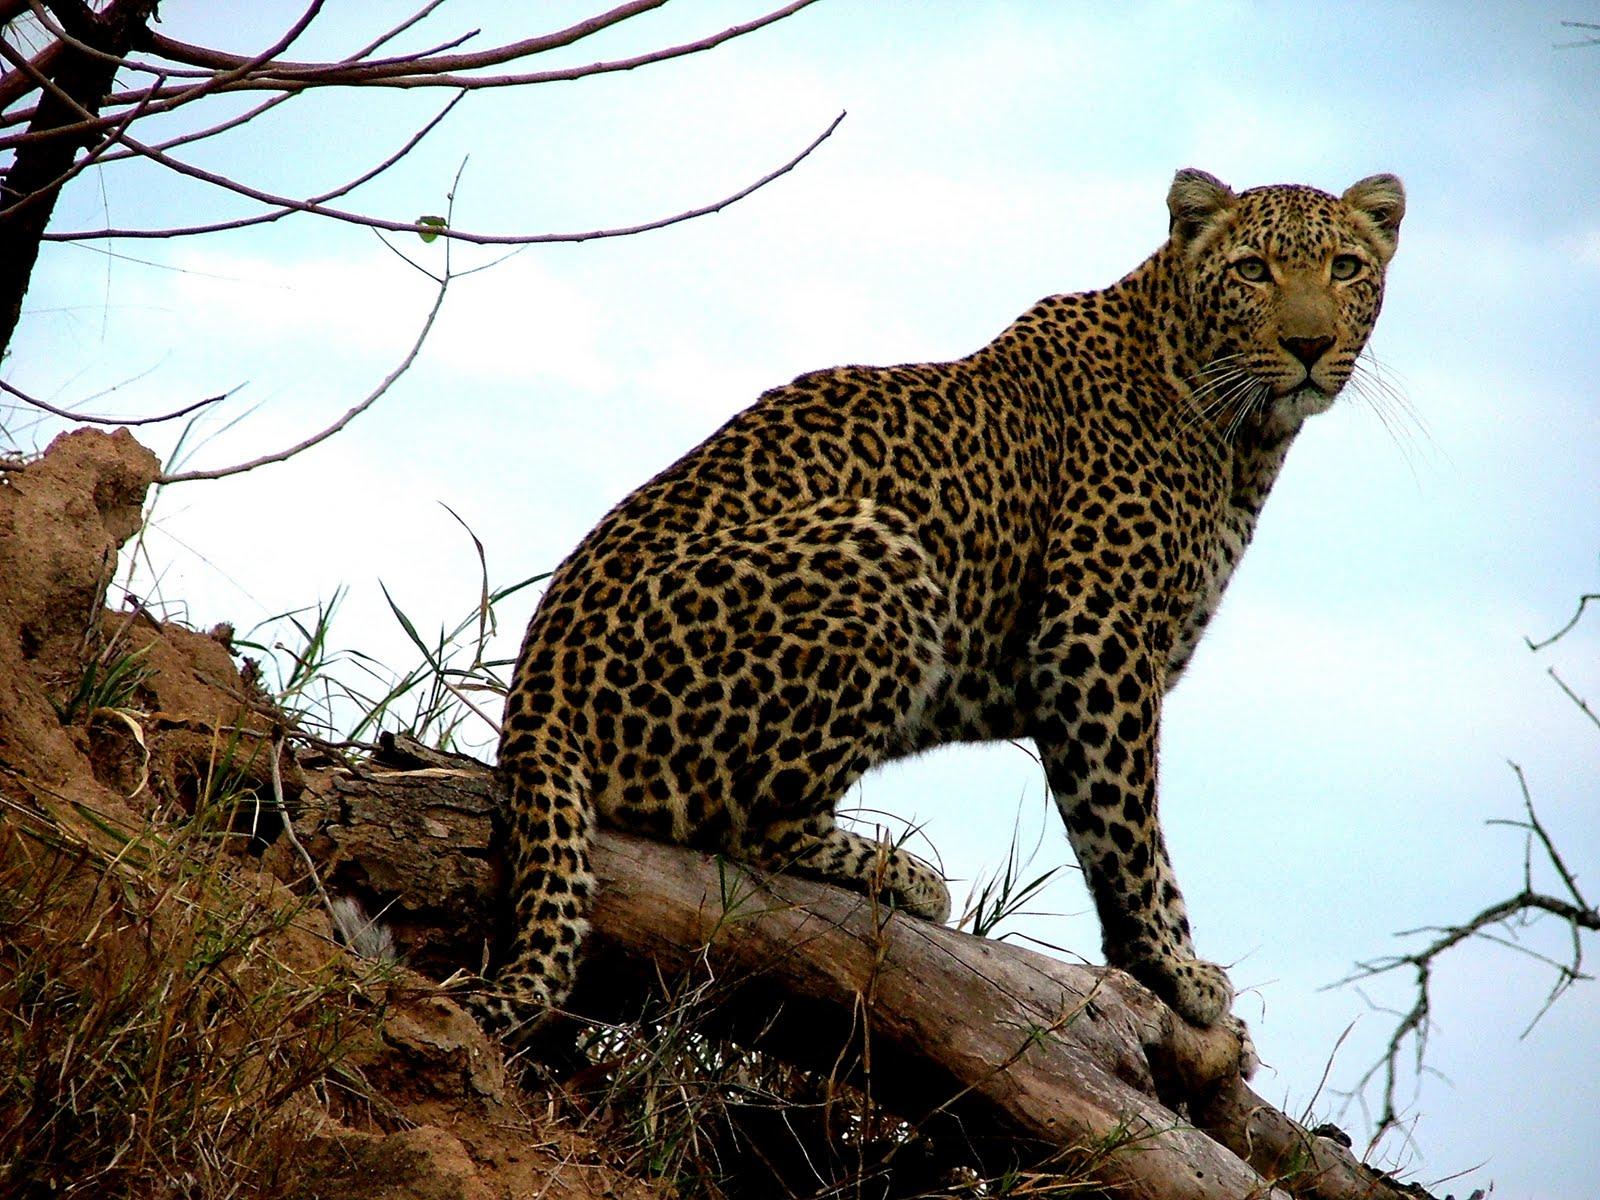 картинки с леопардами пантерами львами пумами отъездом елена